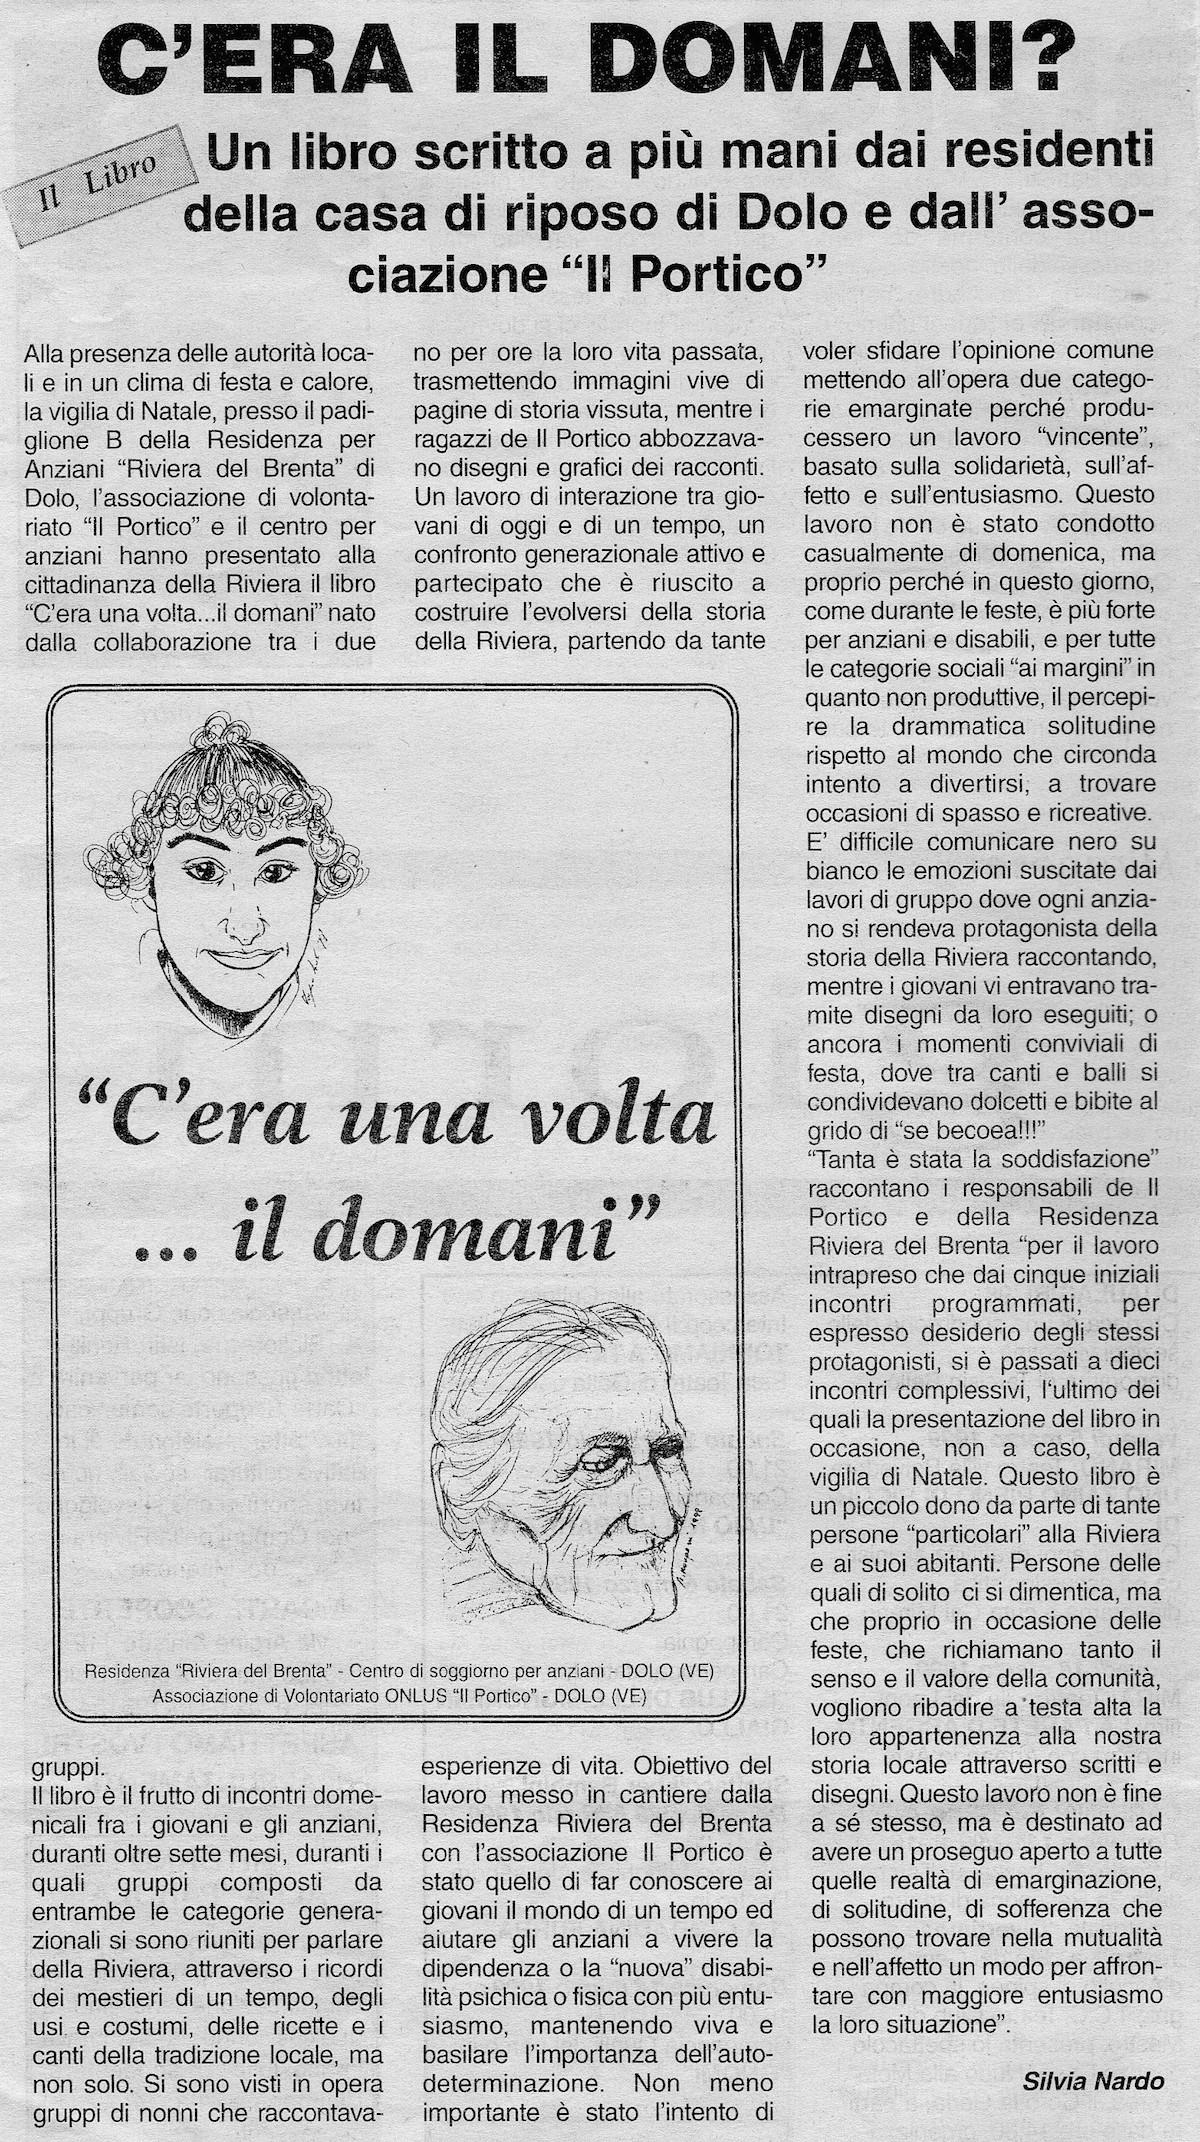 1999.02 Carte Scoperte (p. 8)